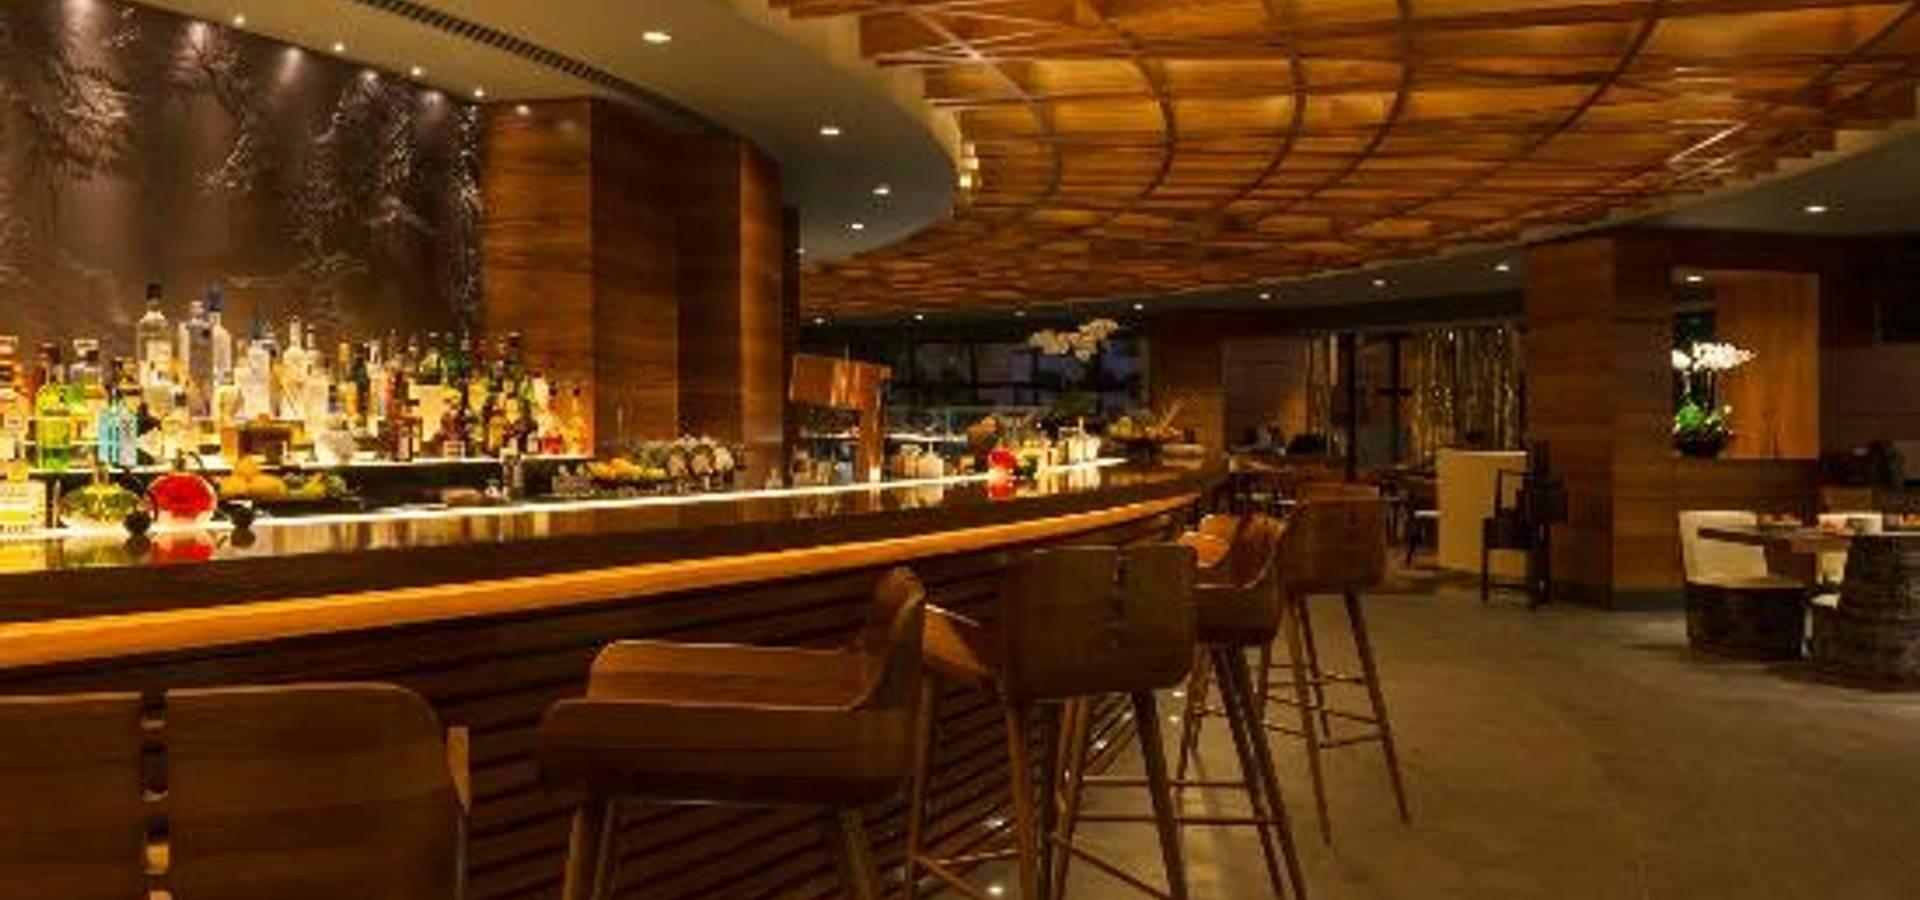 Restaurantes barcelona worldwide home staging en - Barcelona home staging ...